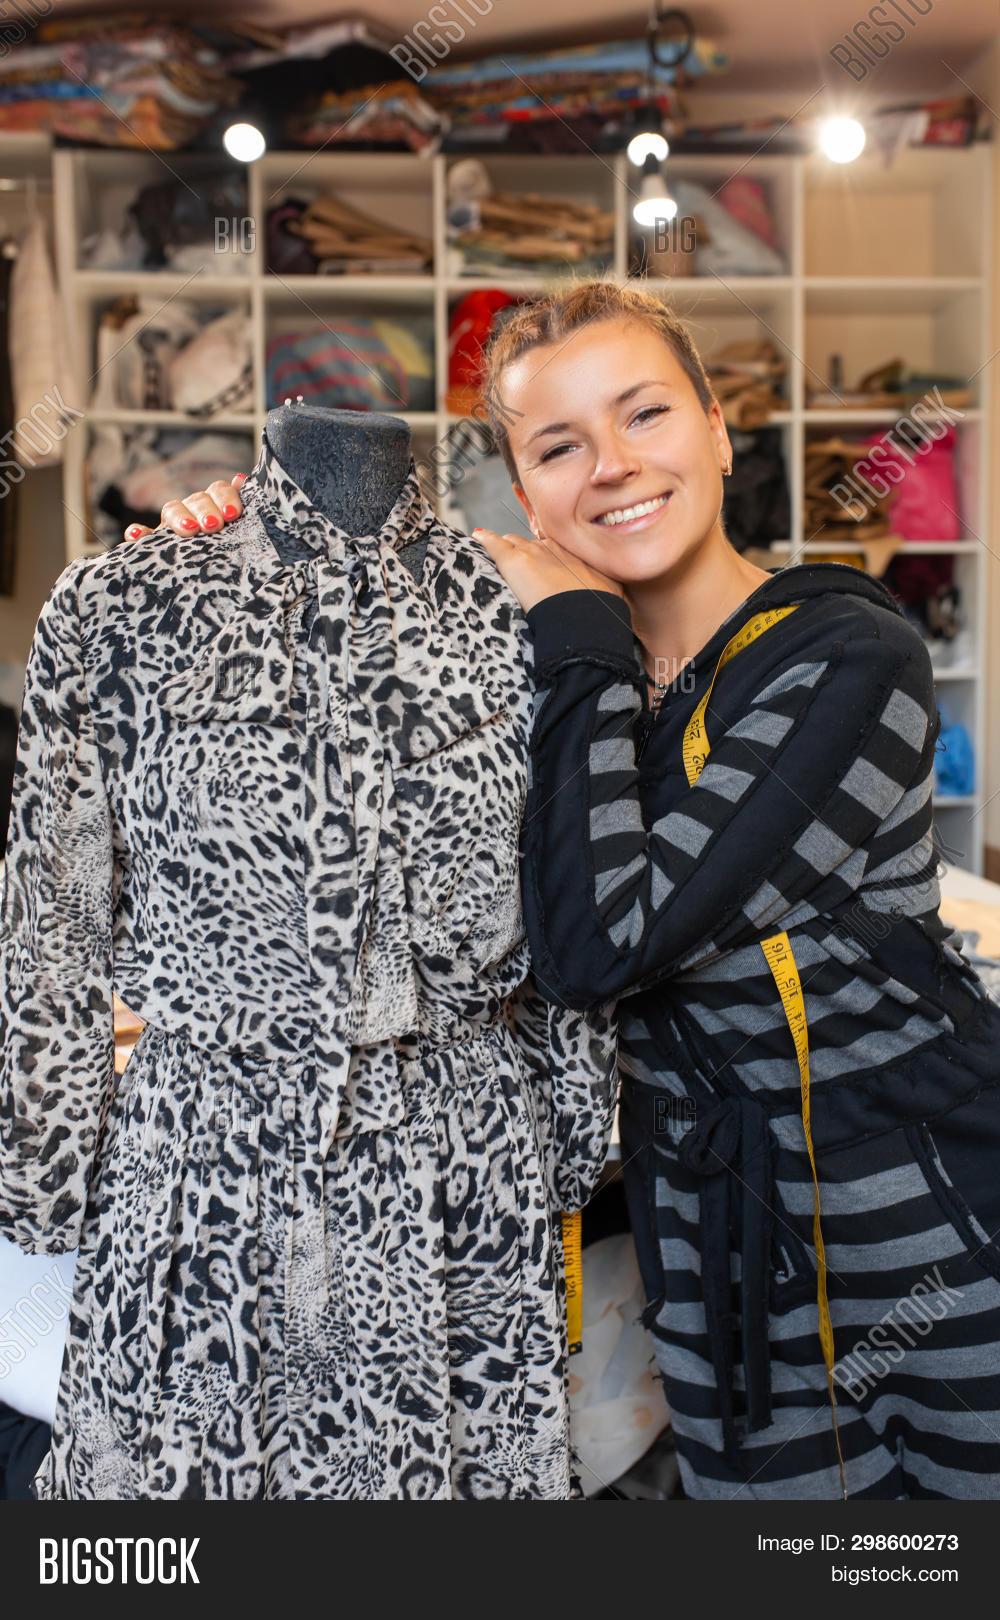 Dressmaker Mannequin Image Photo Free Trial Bigstock